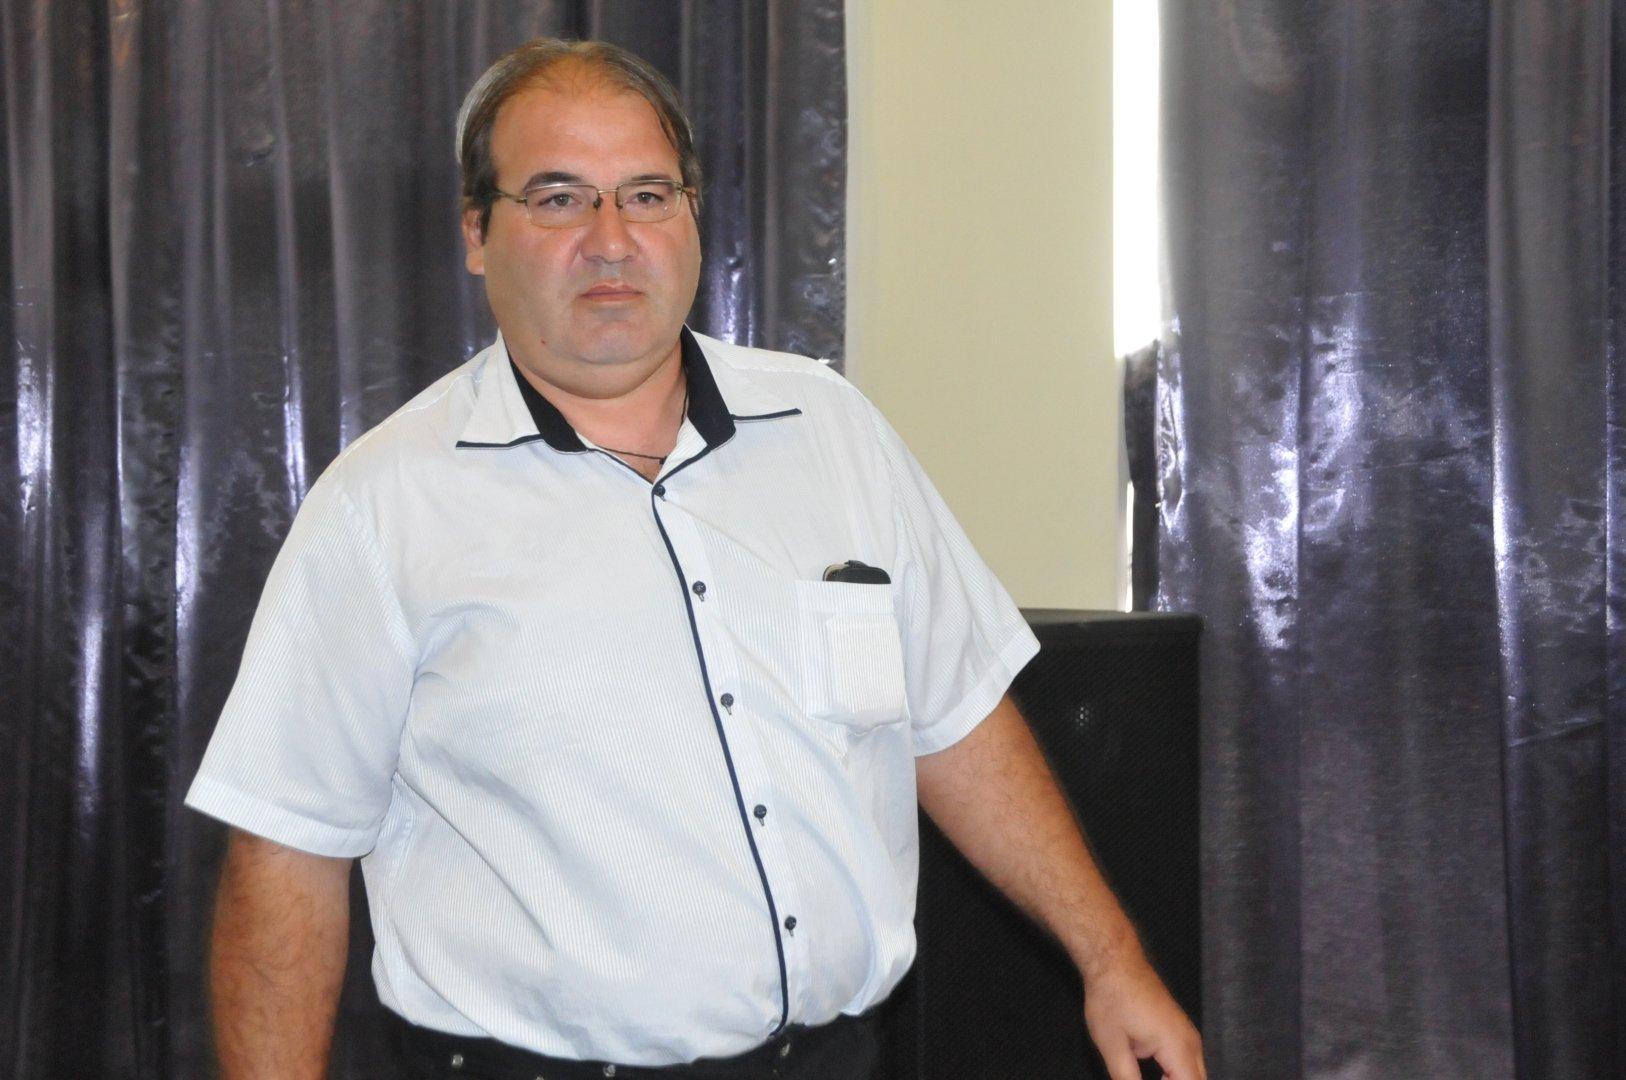 Милен Николов остава директор на РИМ - Бургас след спечелен конкурс. Снимка Архив Черноморие-бг